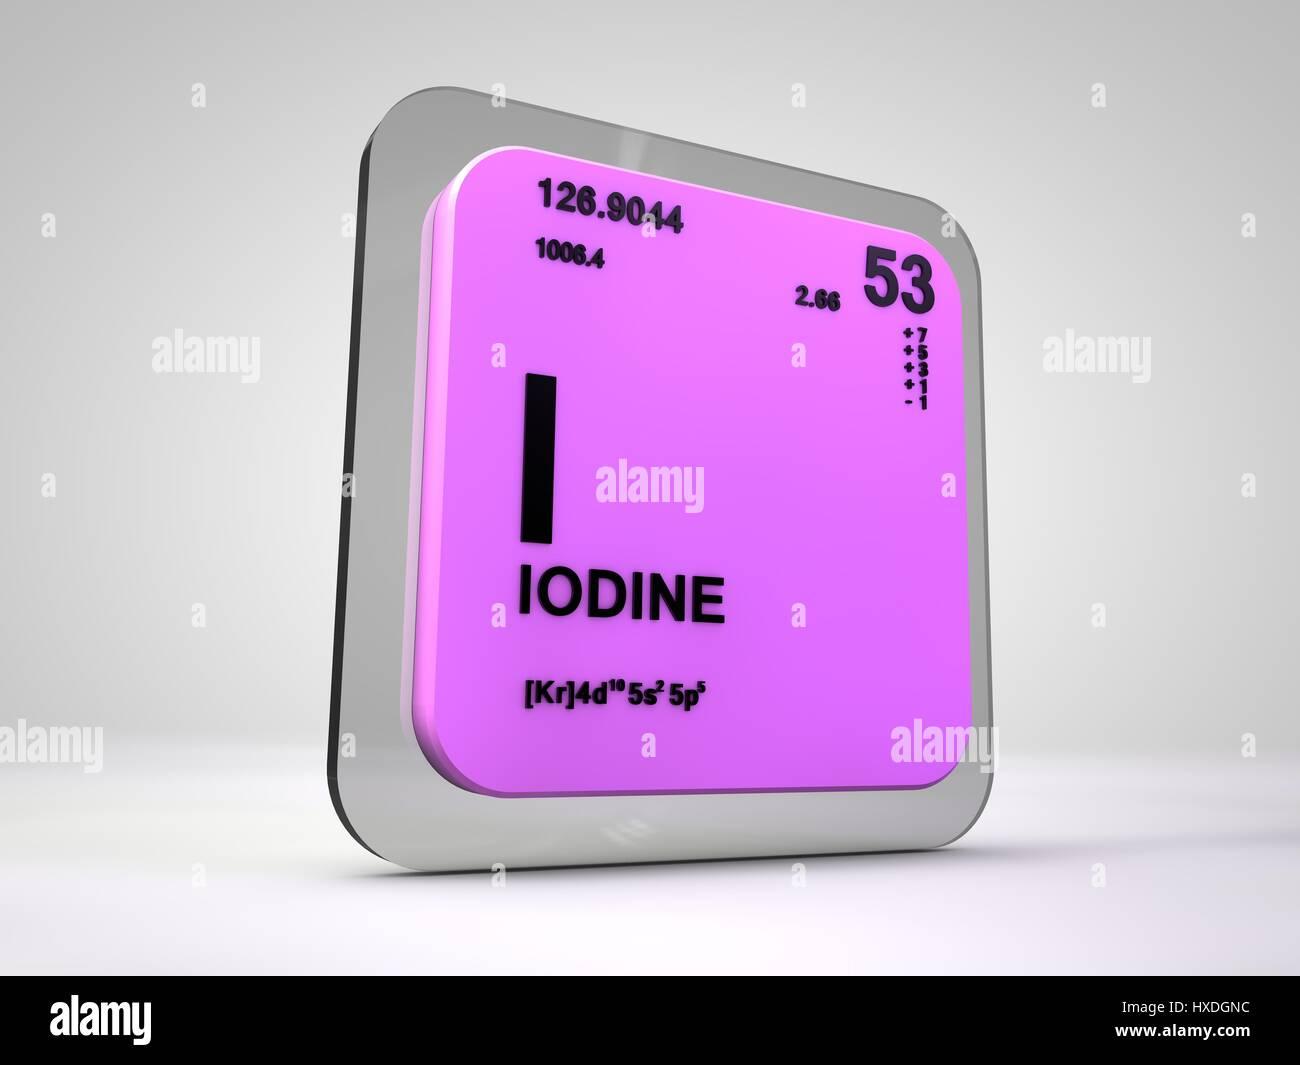 Iodine i chemical element periodic table 3d render stock photo stock photo iodine i chemical element periodic table 3d render gamestrikefo Choice Image